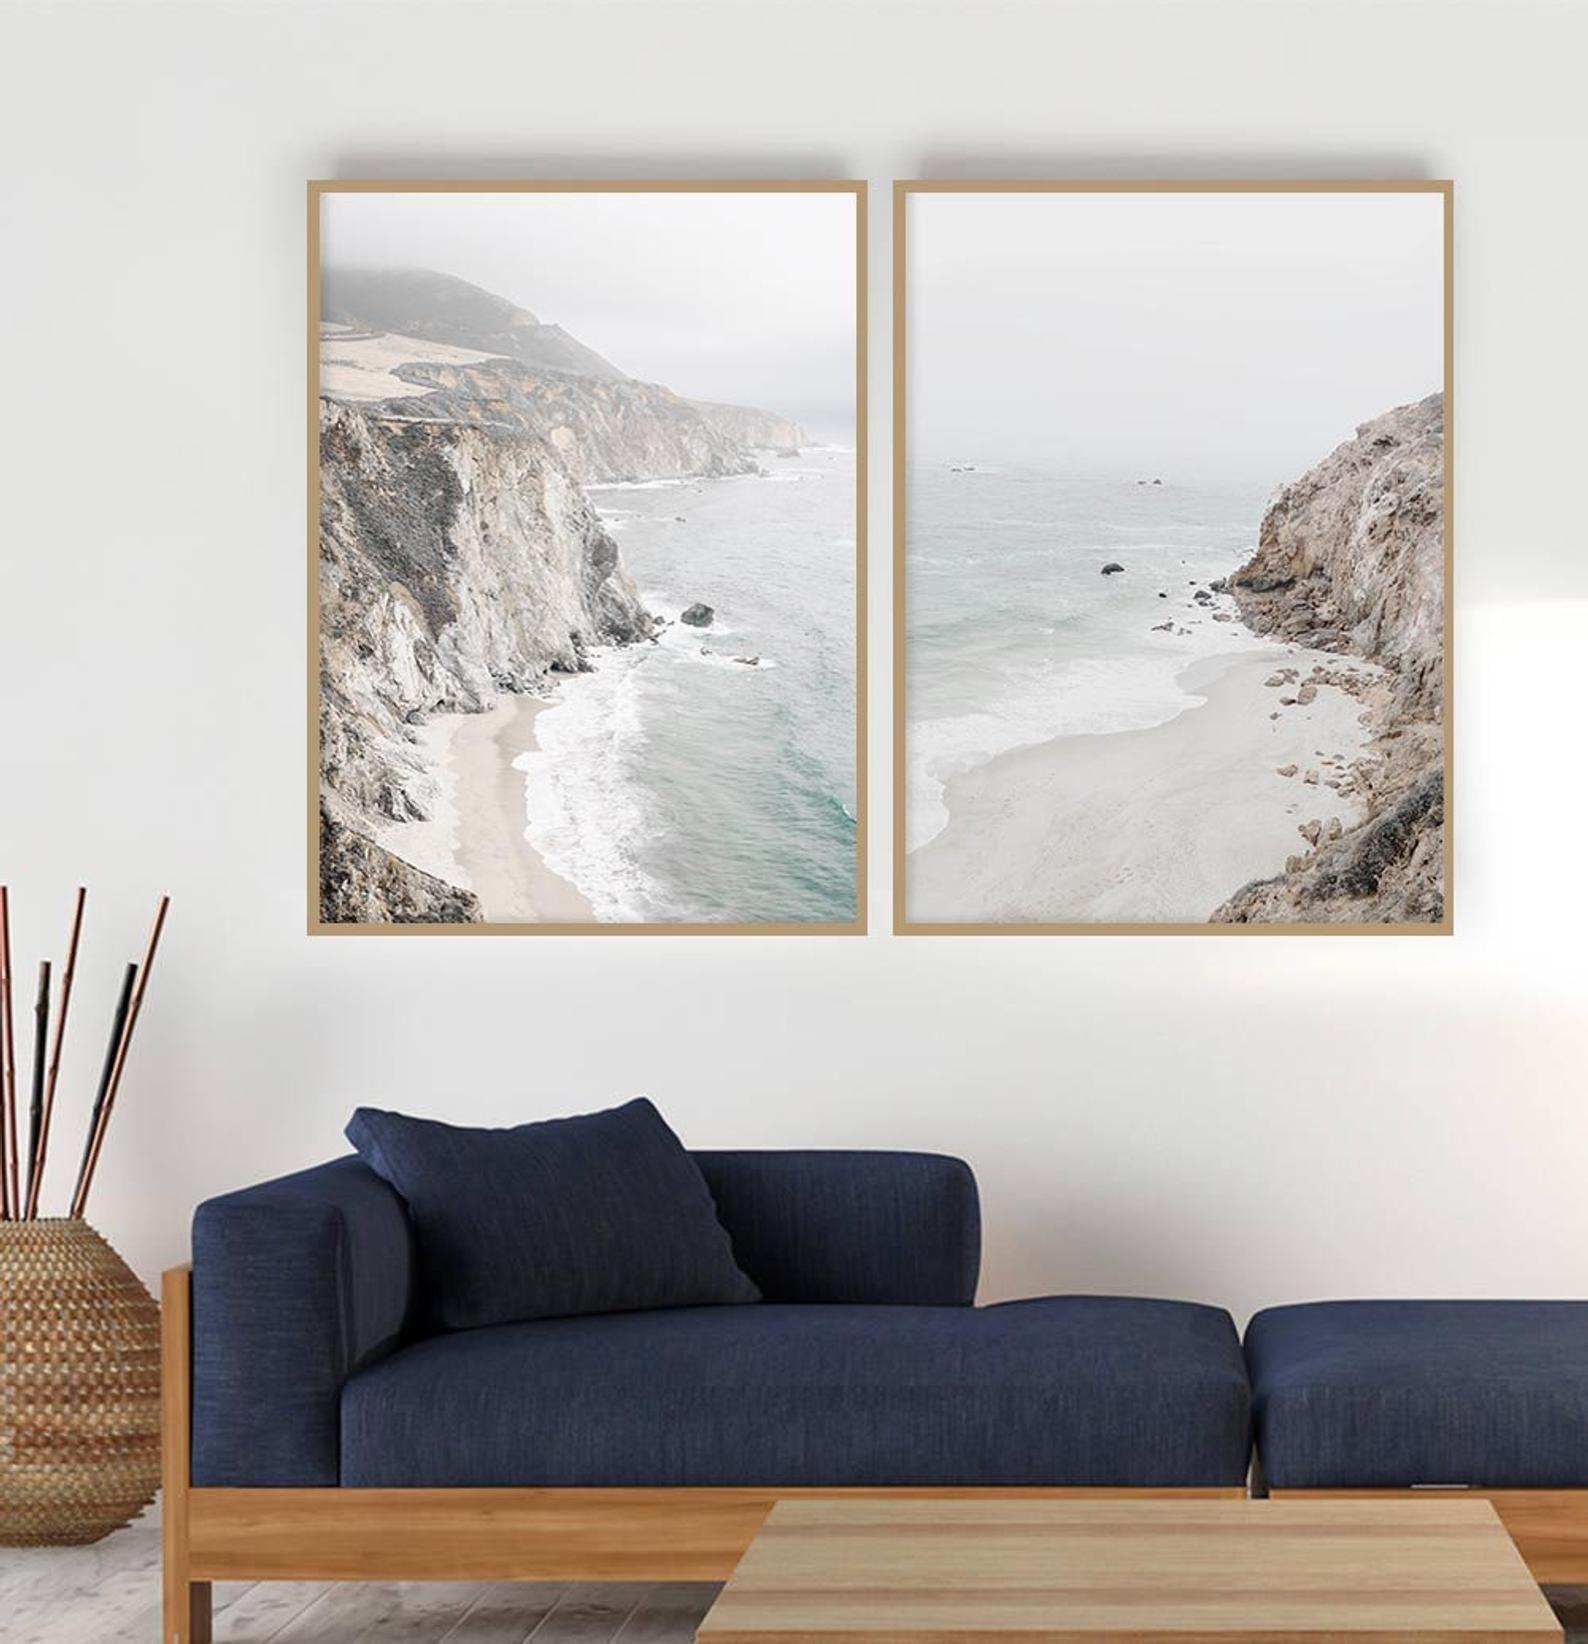 Decorative Coastal Wall Art Sets Coastal Wall Art Beach Wall